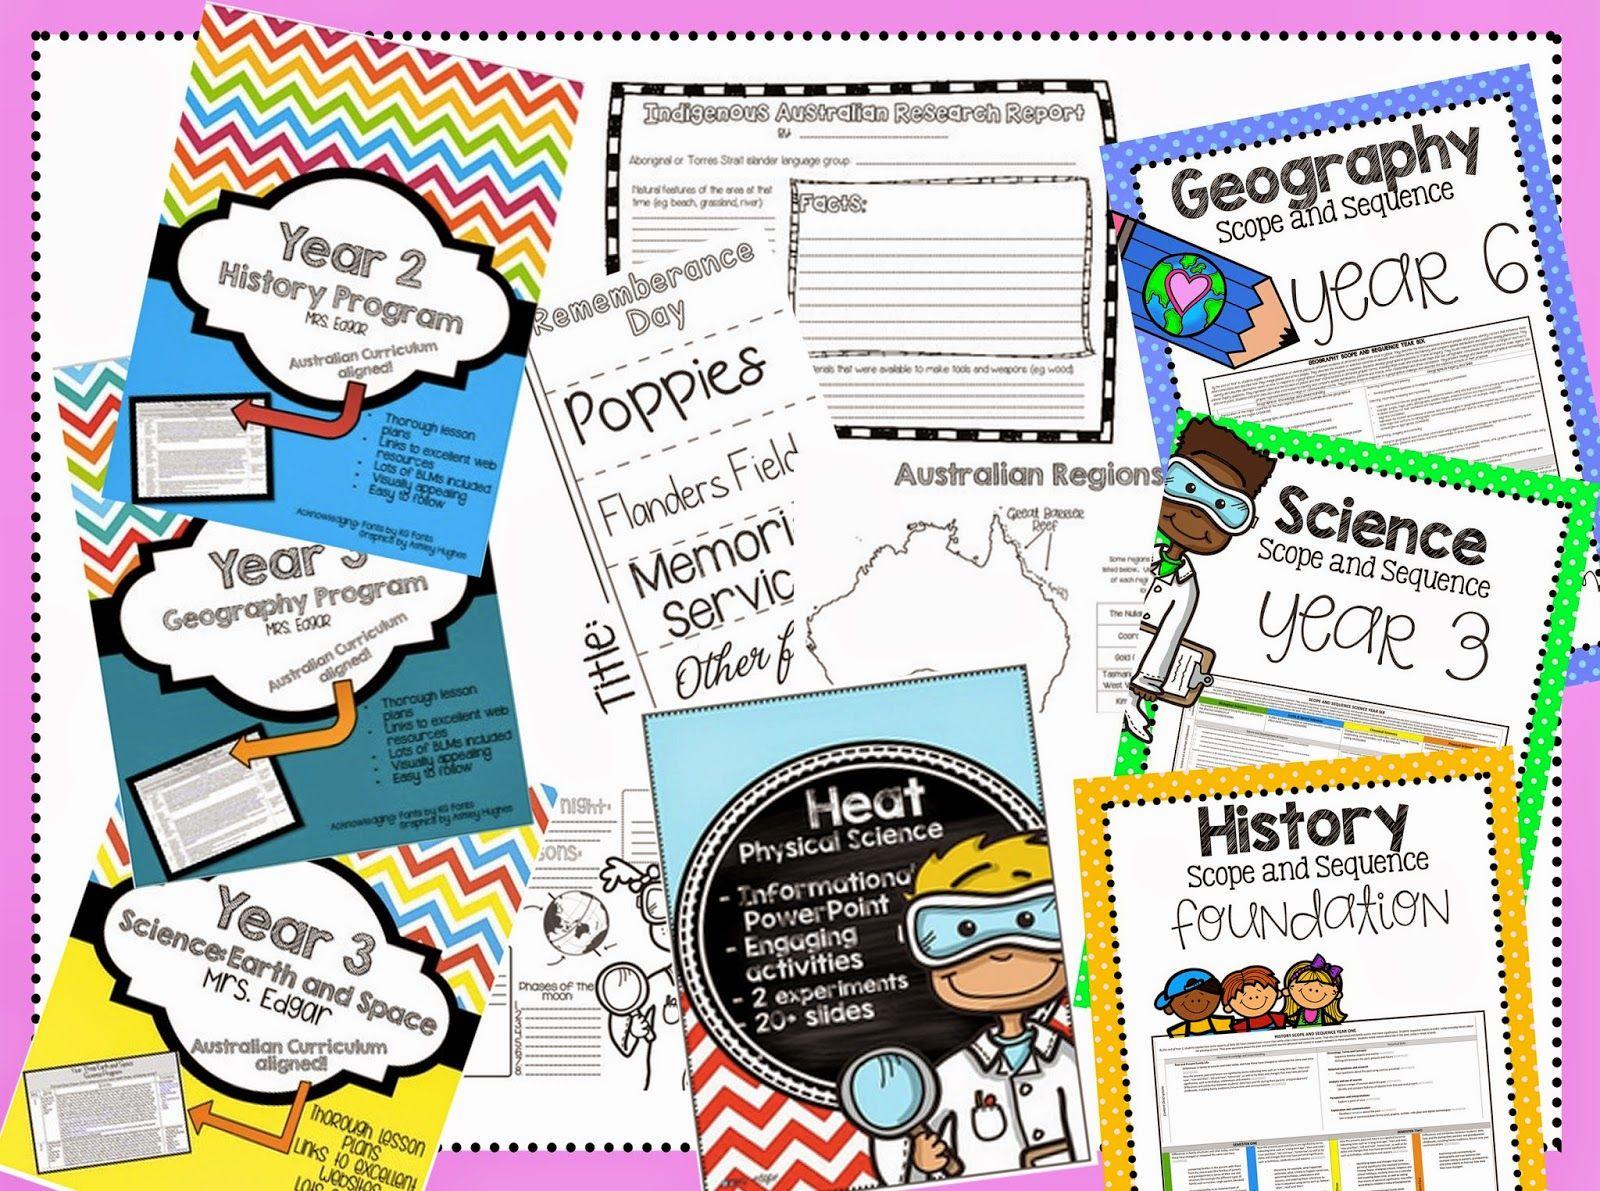 Australian curriculum resources programs activities and blms australian curriculum resources programs activities and blms sciox Gallery